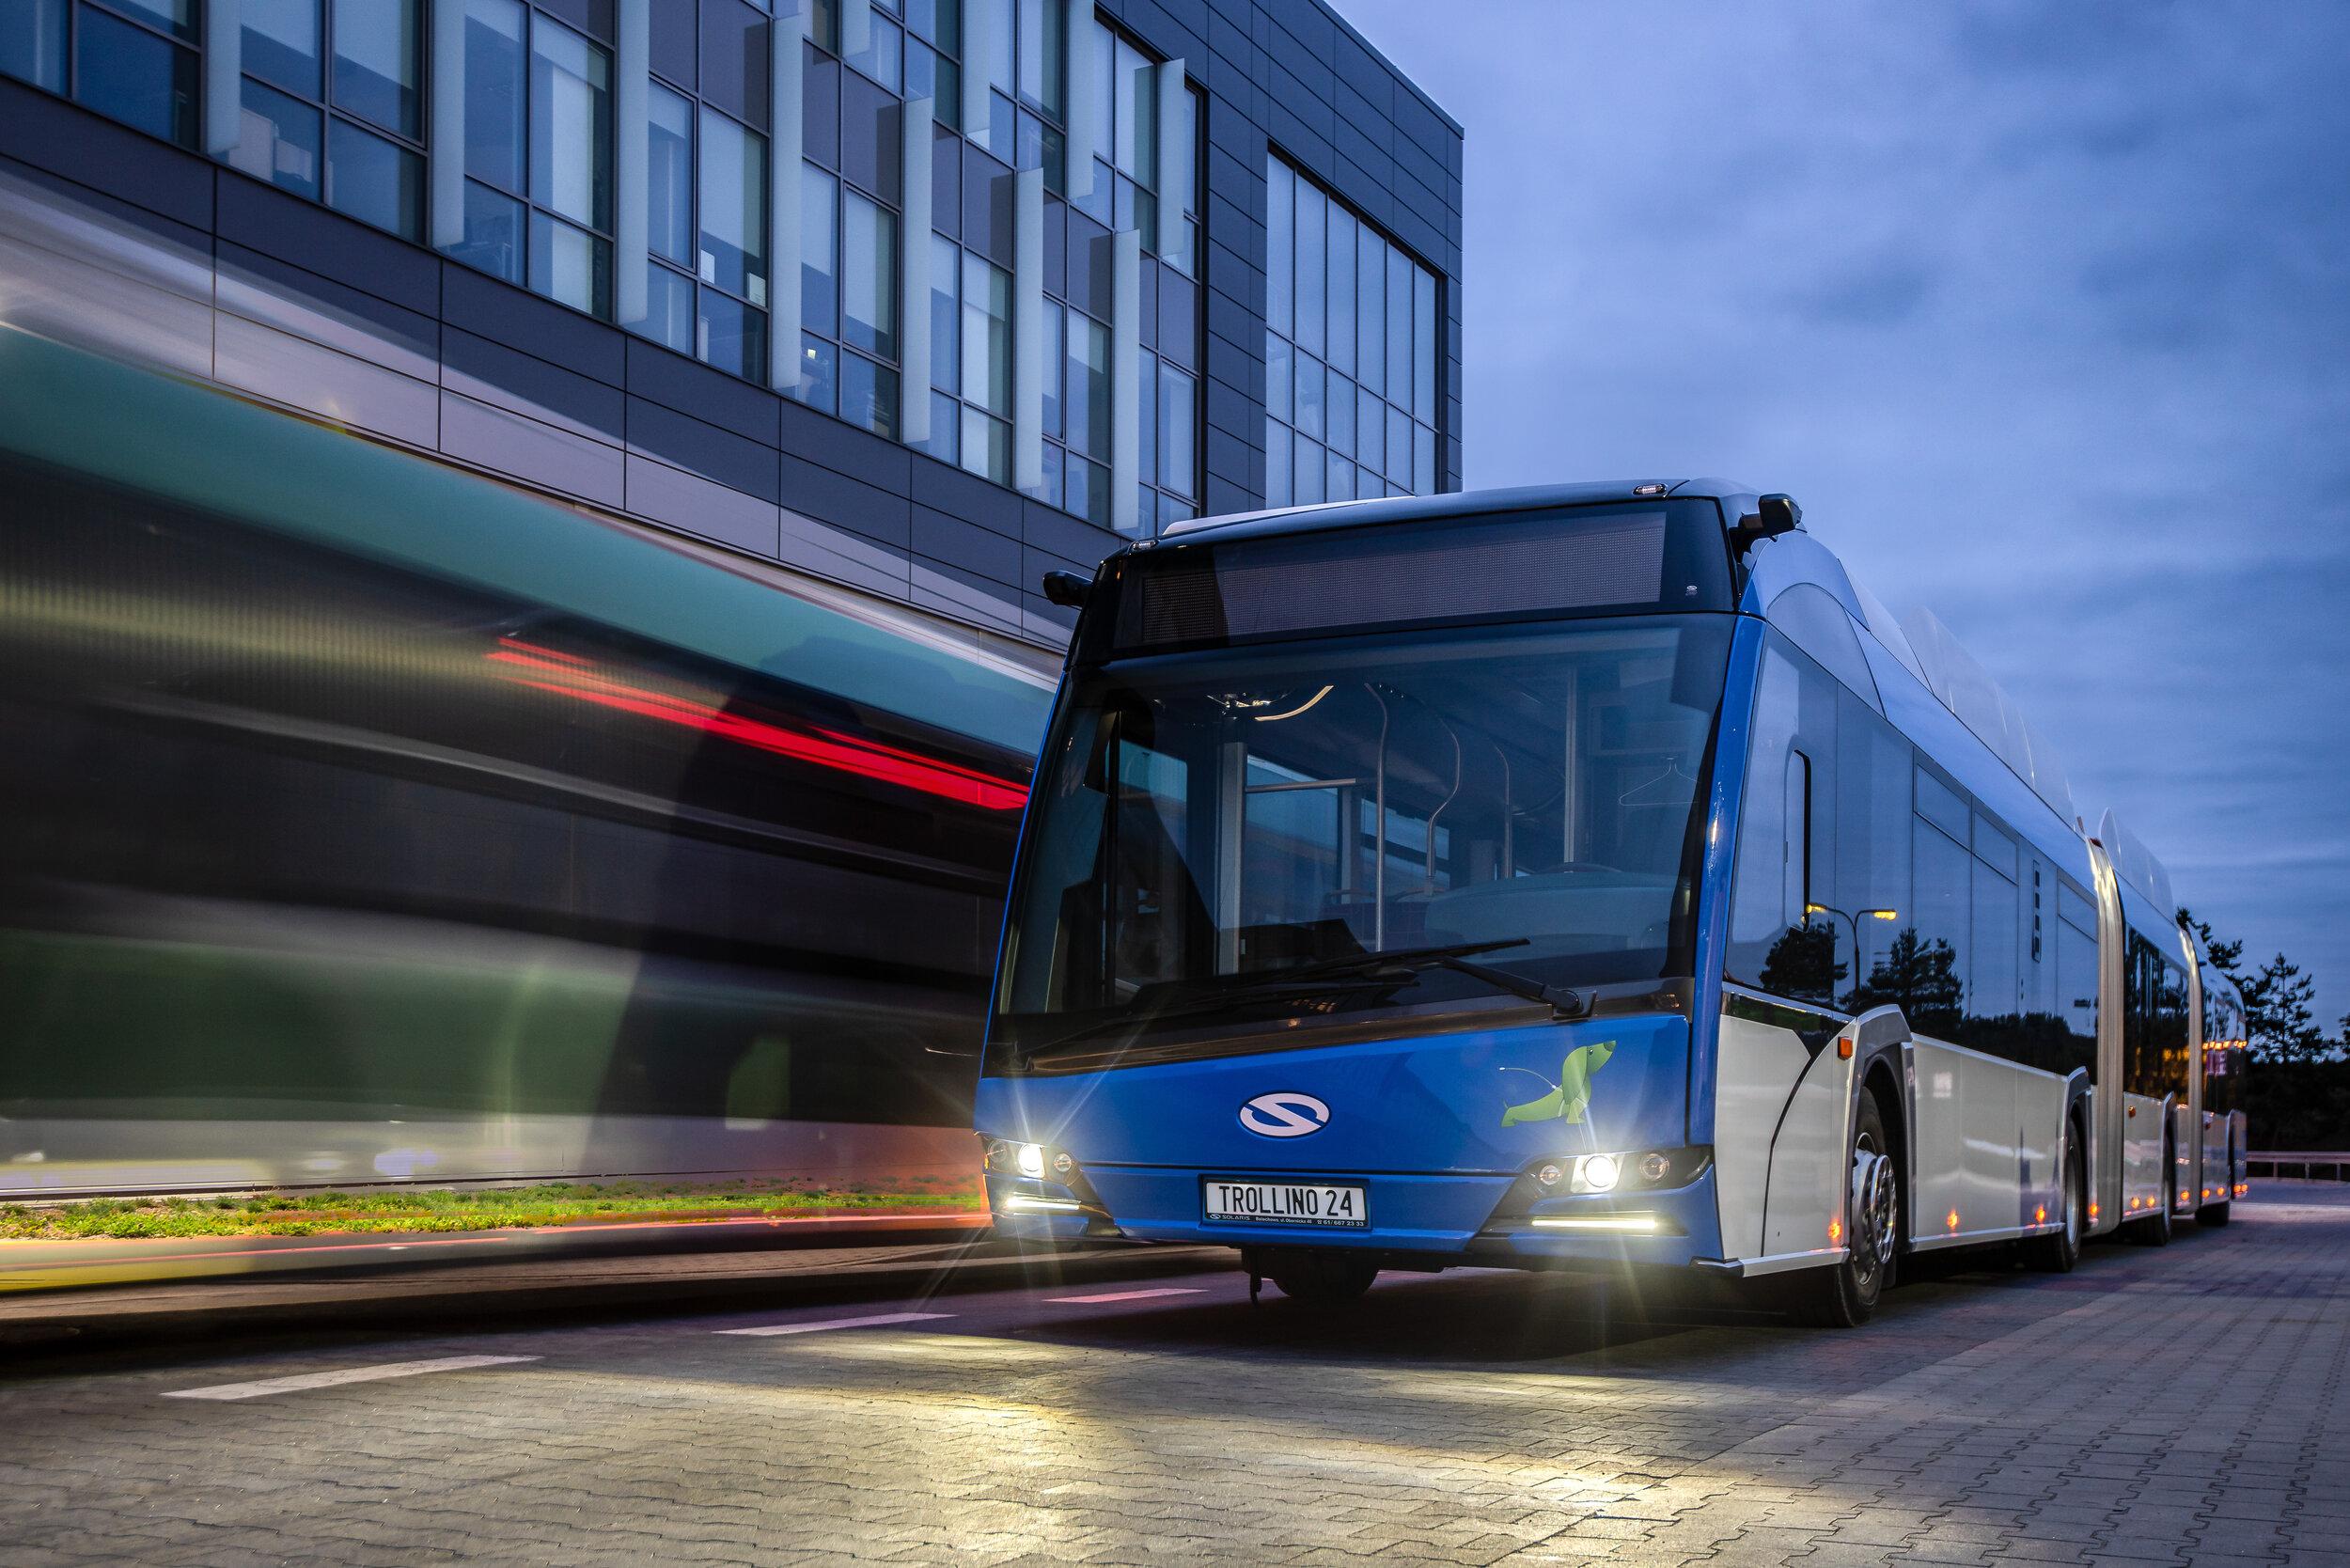 Nový MetroStyle od Solarisu na prototypu vozu Trollino 24. (foto: Solaris Bus & Coach)